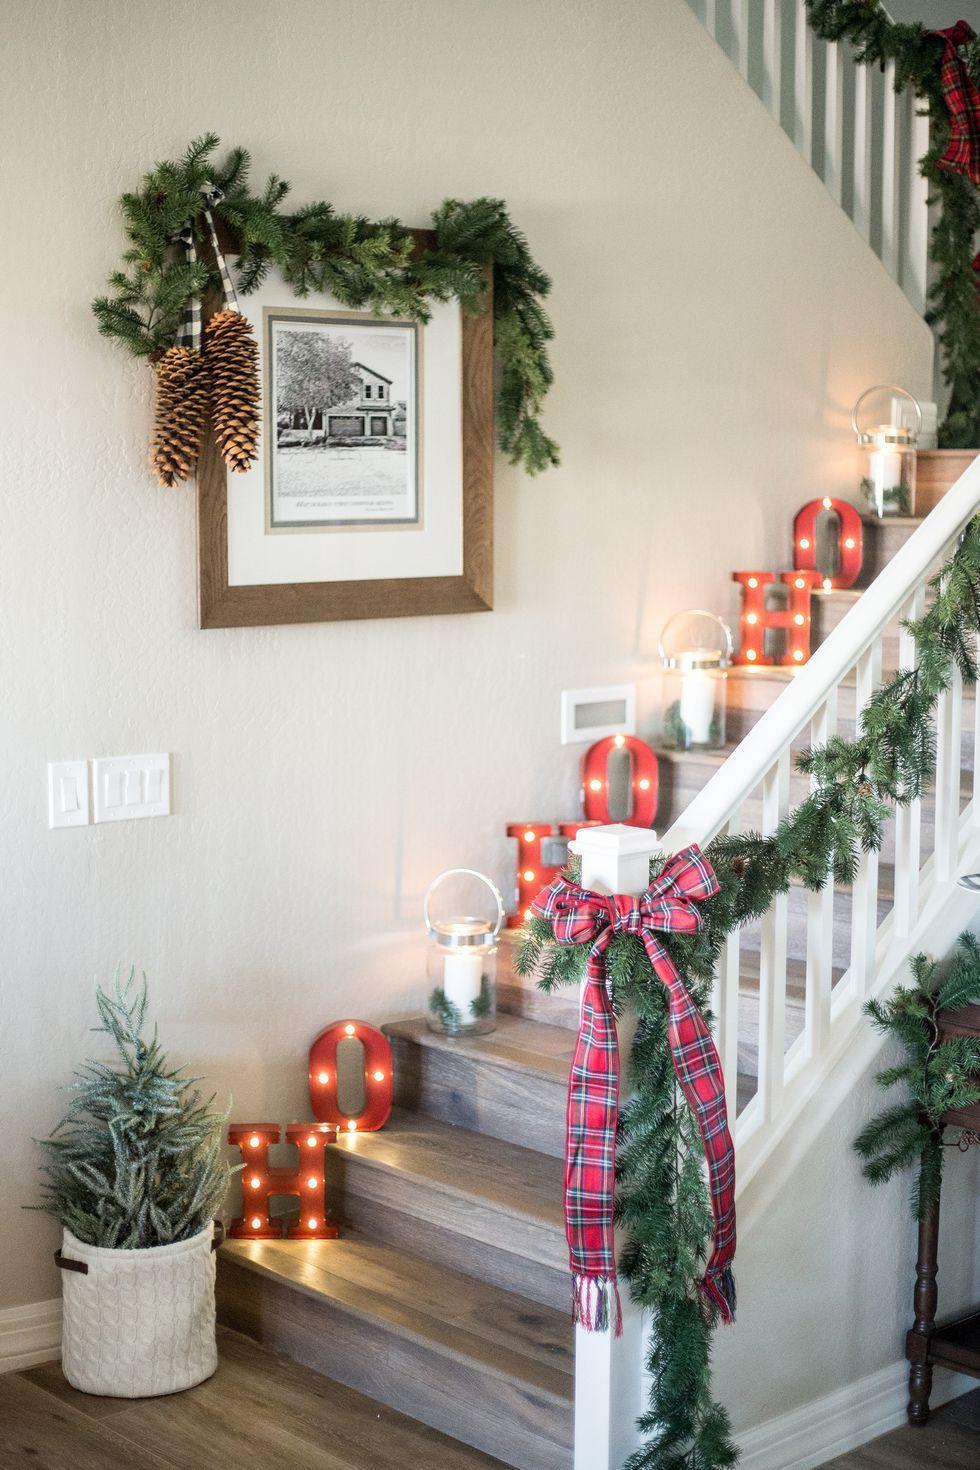 9 christmas wall decorating ideas elegant holiday wall decoration rh elledecor com simple home decor for christmas diy home decor ideas for christmas